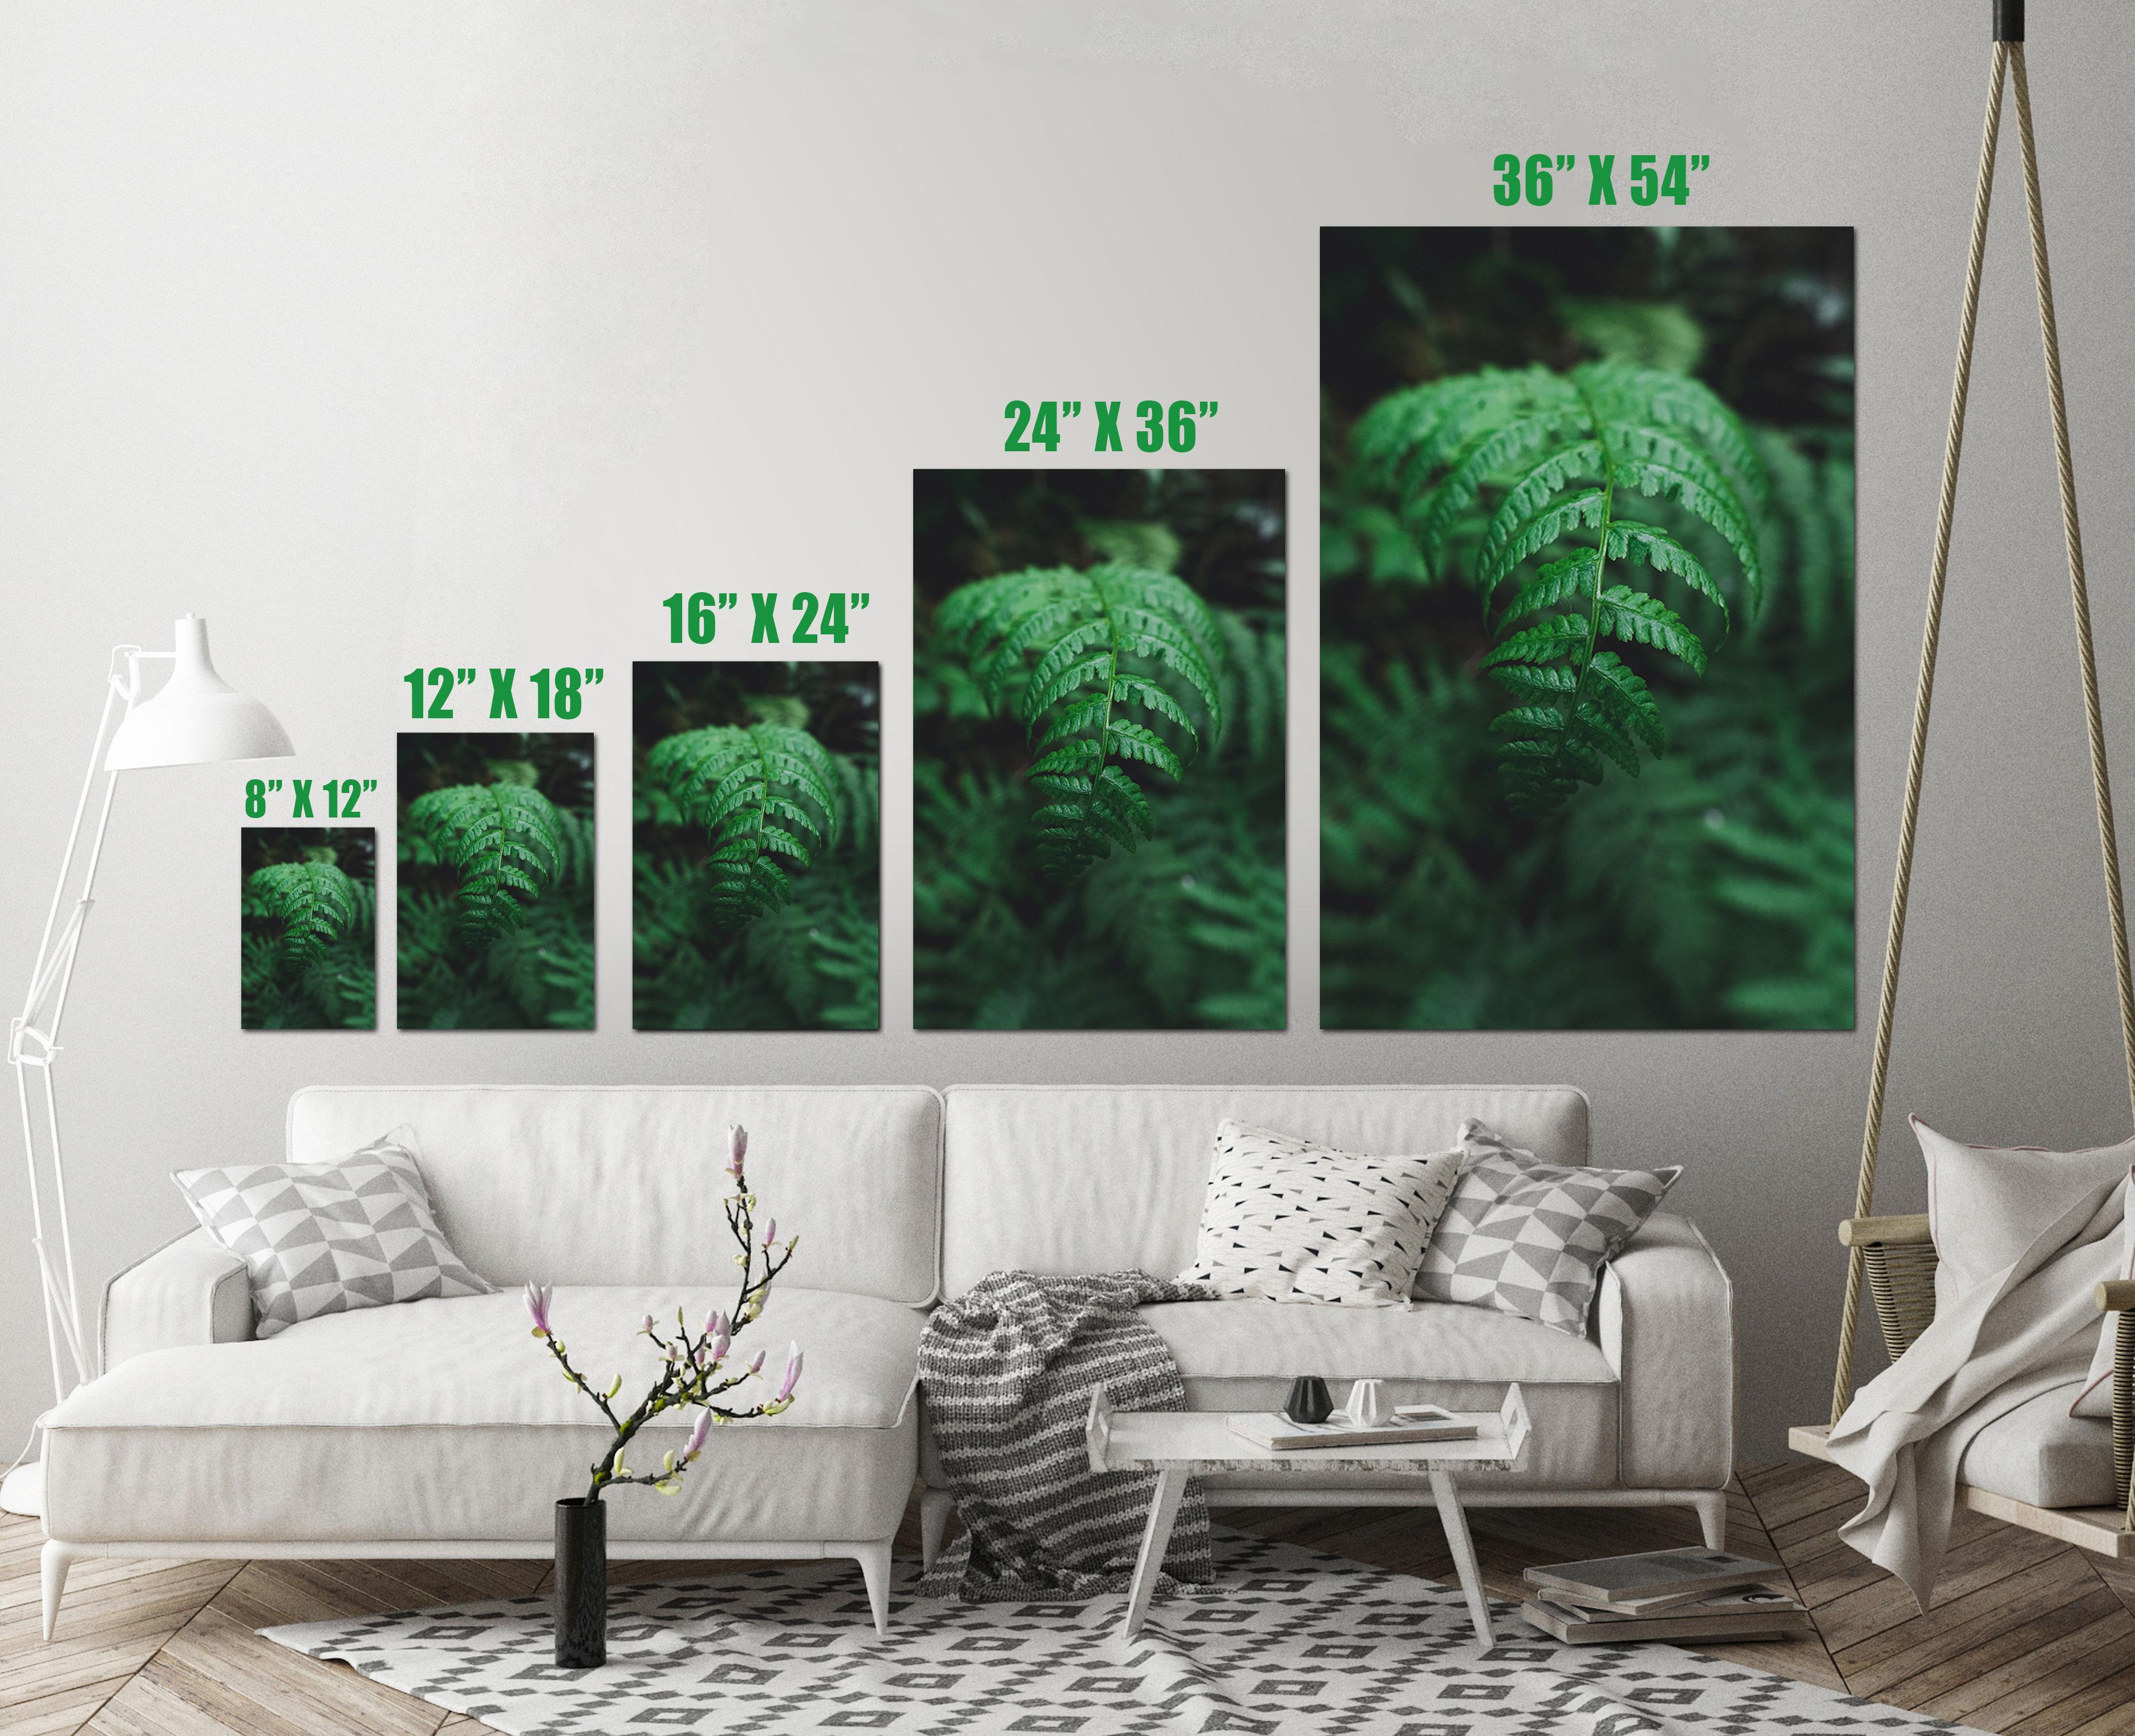 Fern Leaf Plant Close Up Green Nature Art Print Wall Decor Image